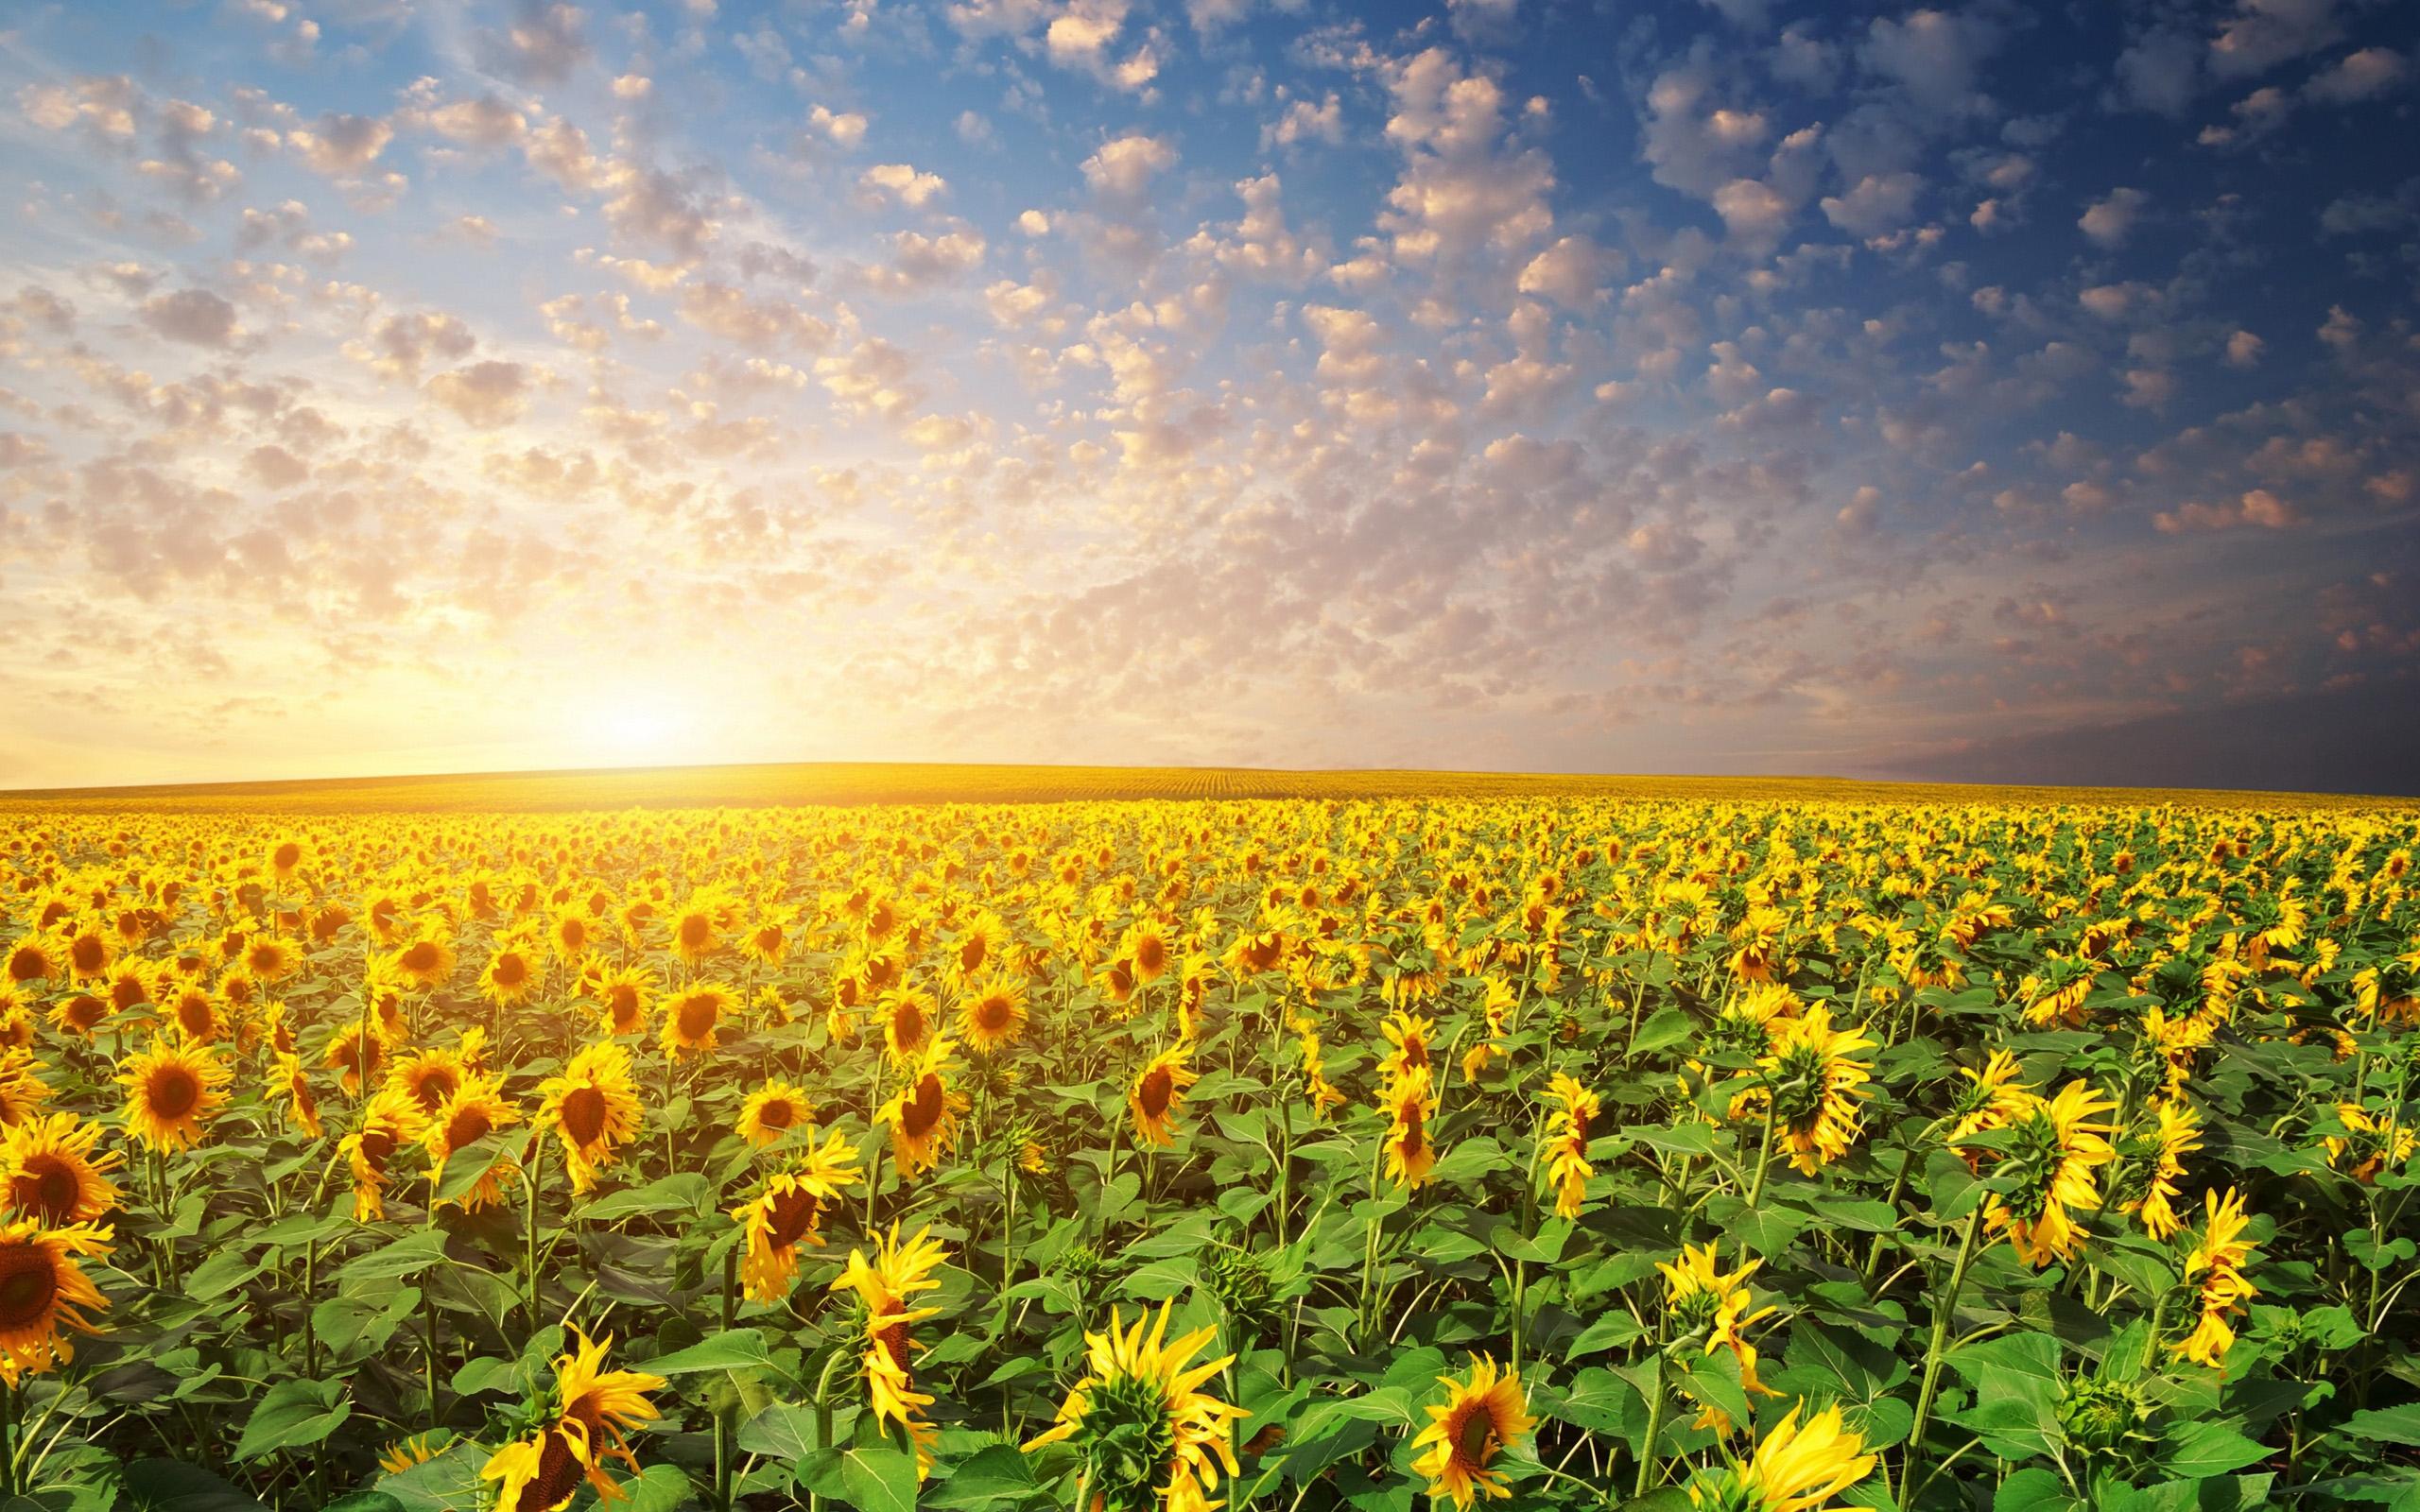 Fall Sunflower Desktop Wallpaper Download Free Sunrise Wallpapers Pixelstalk Net